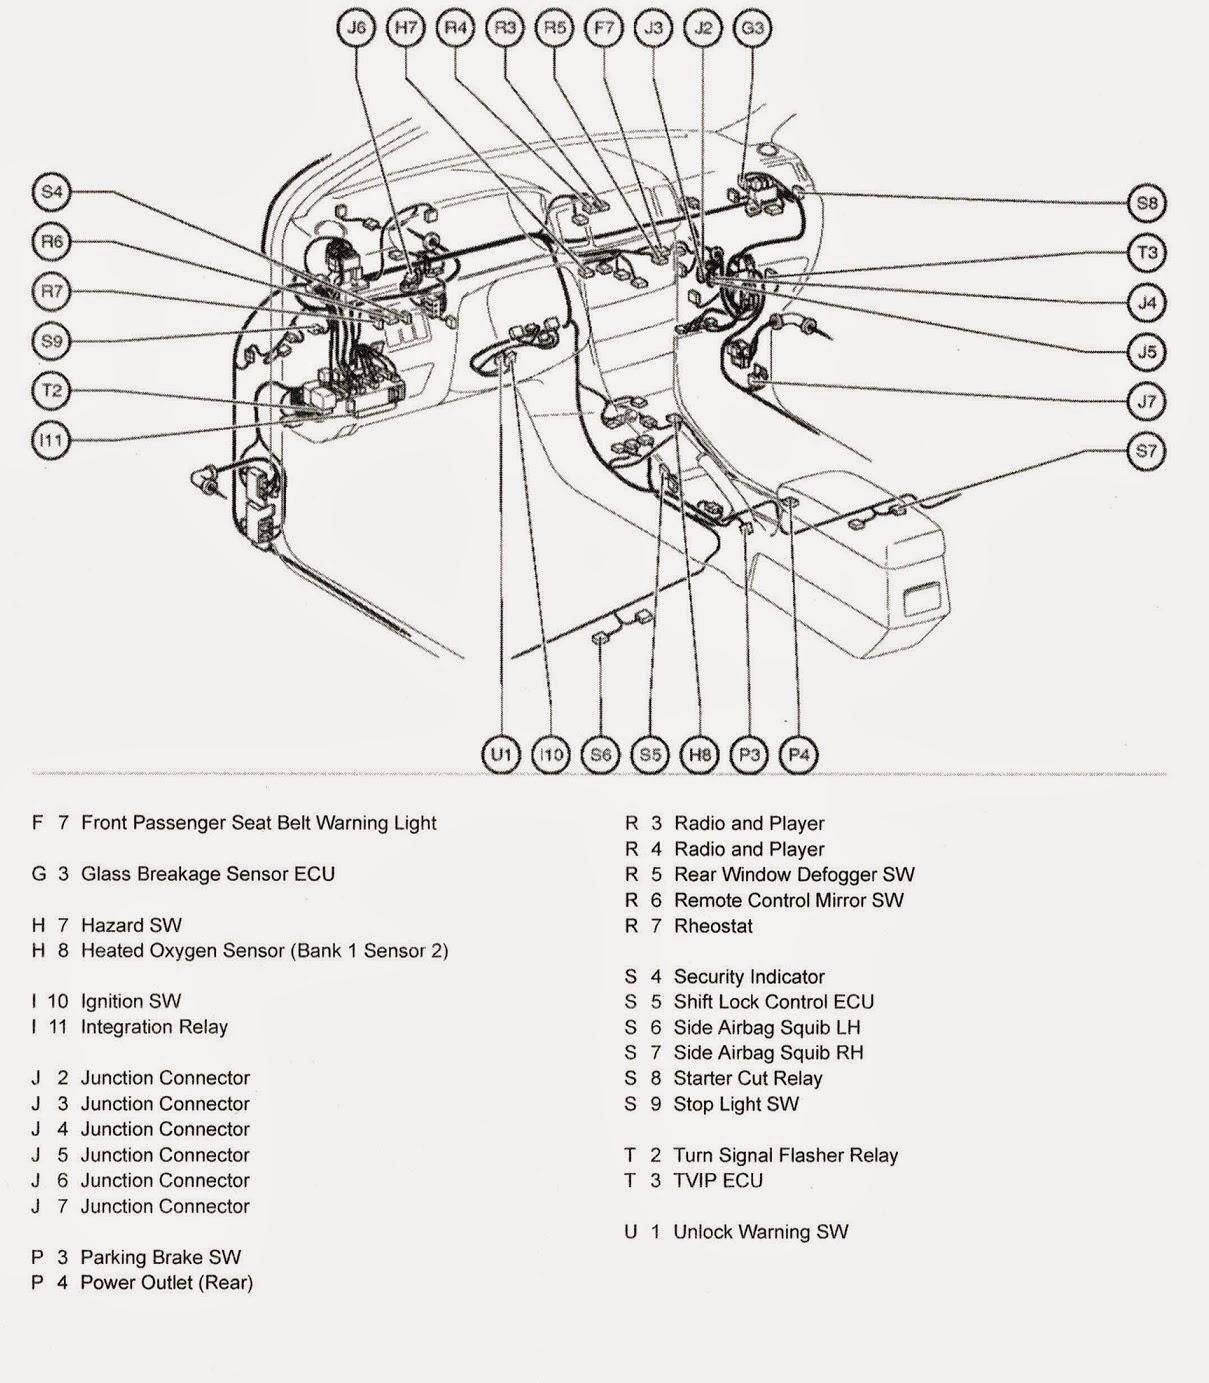 diagrama de cableado de toyota corolla